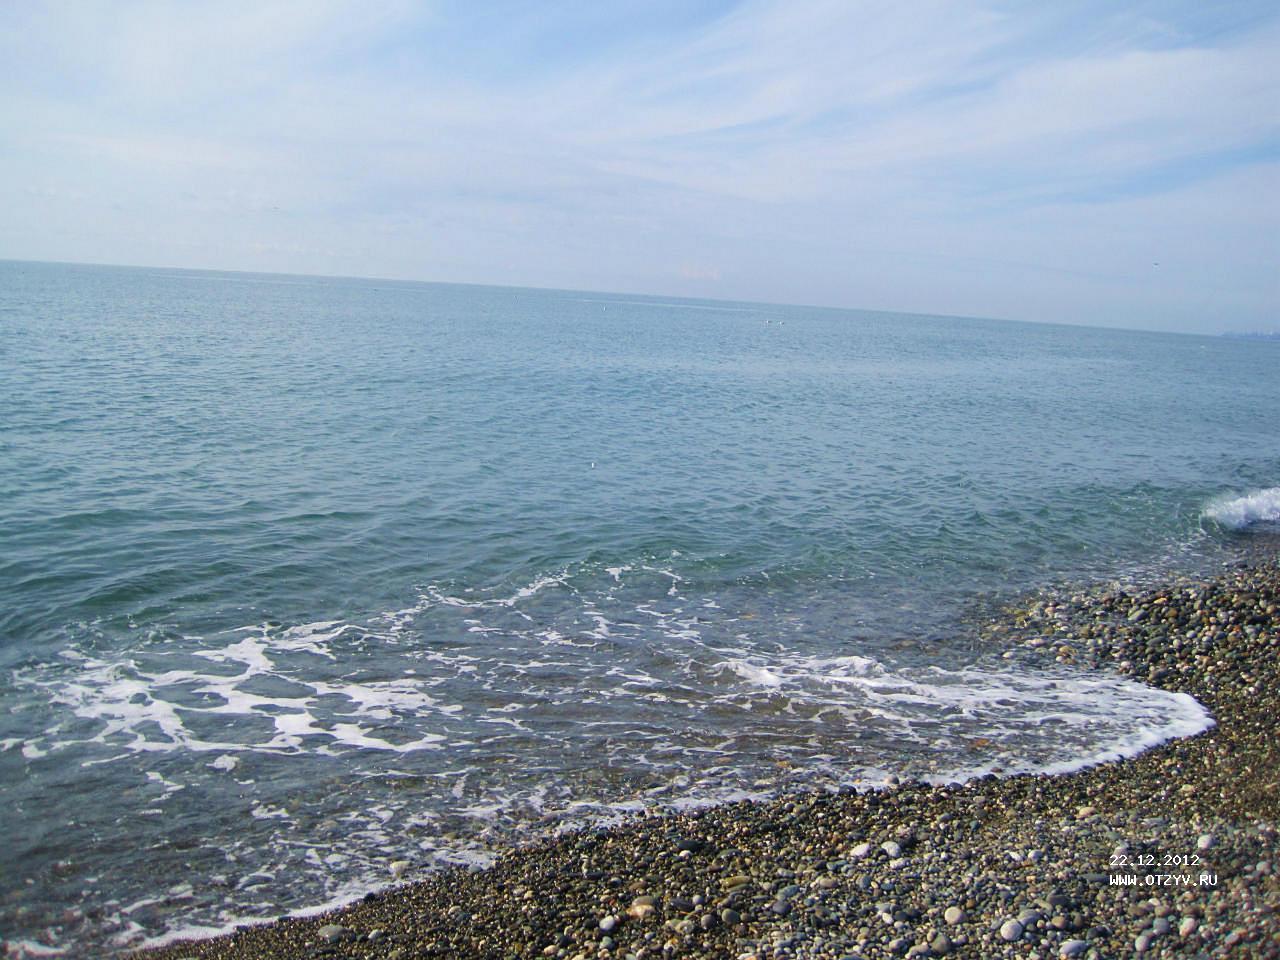 креативные идеи для фото на море с